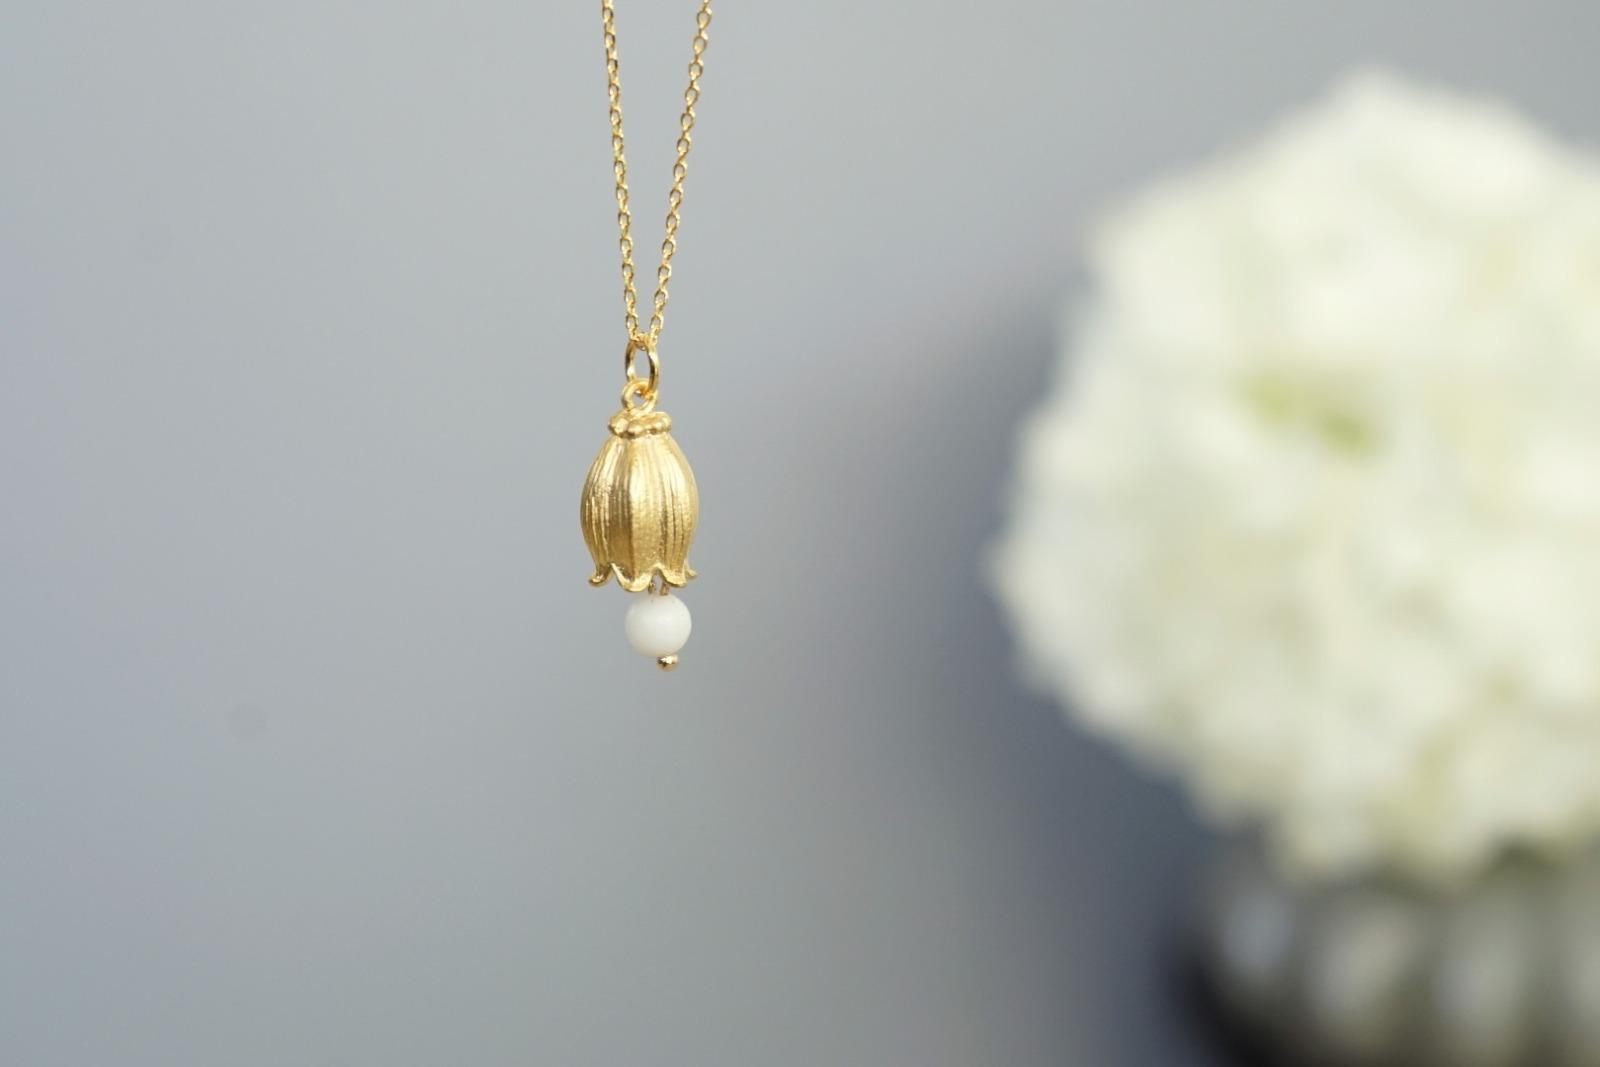 Kette vergoldet mit Glockenblume und Jadeperle - 3